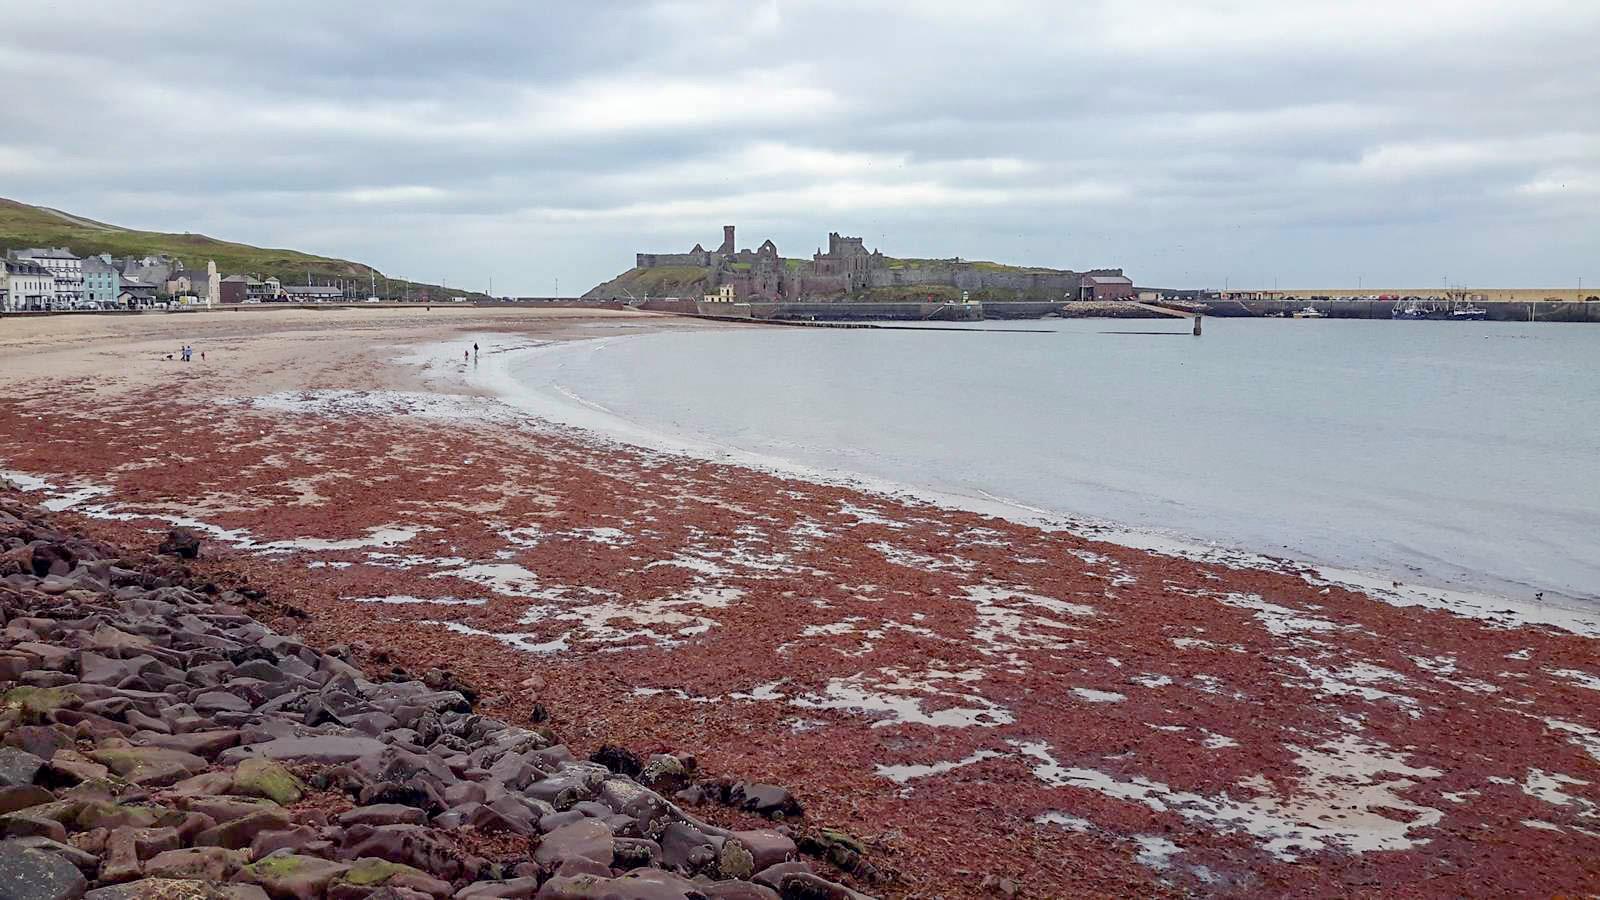 Peel Castle from across the beach